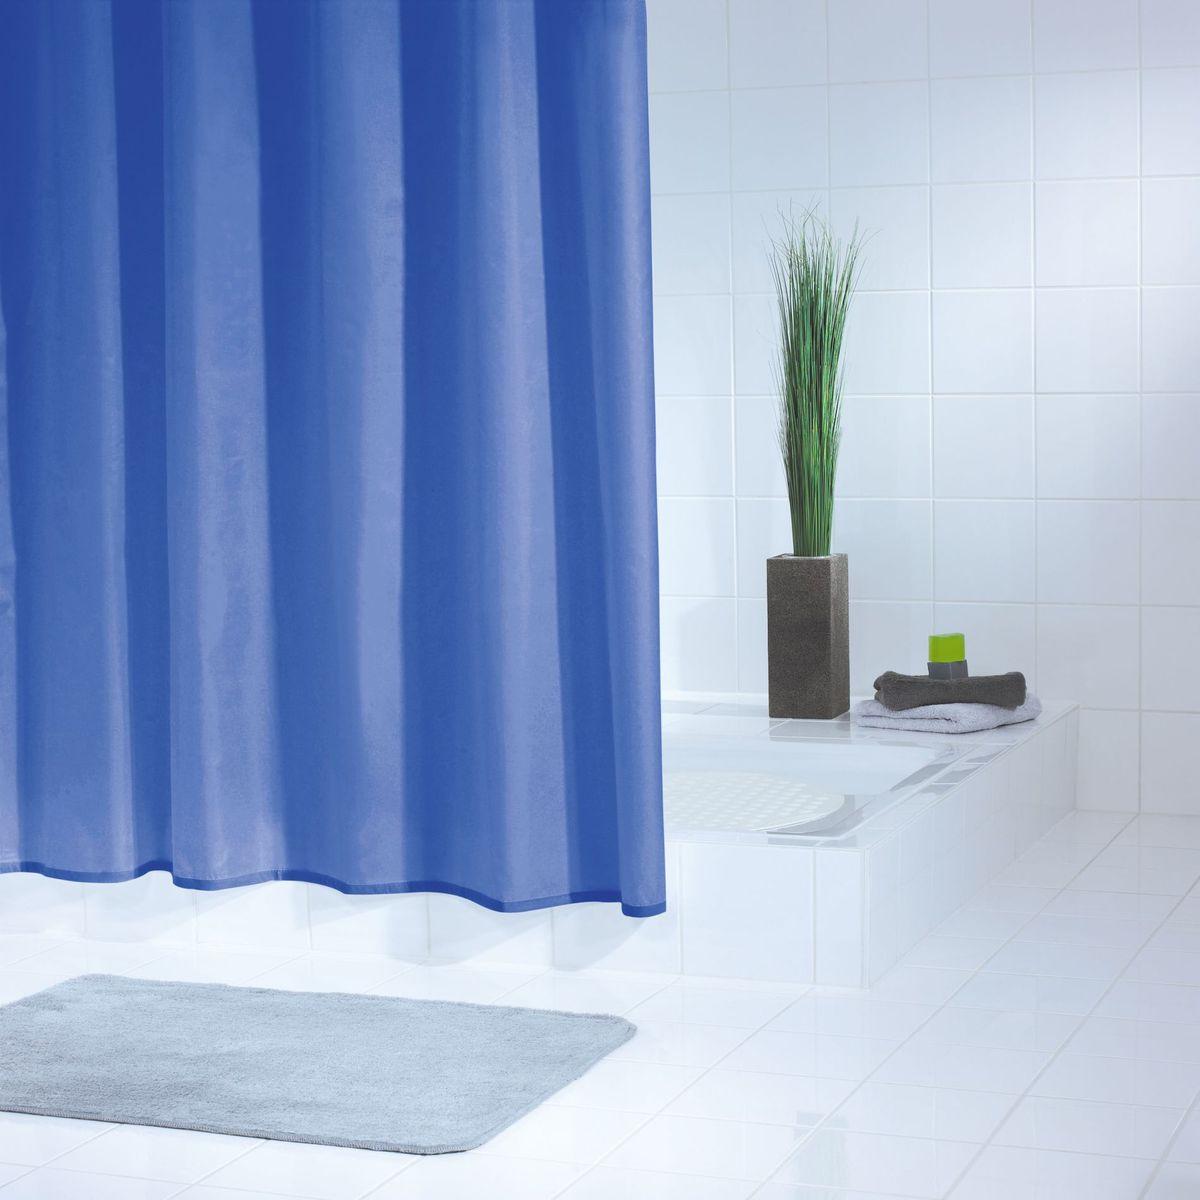 Штора для ванной комнаты Ridder Standard, цвет: синий, голубой, 180 х 200 см штора для ванной комнаты ridder helgoland цвет синий голубой 240 х 180 см